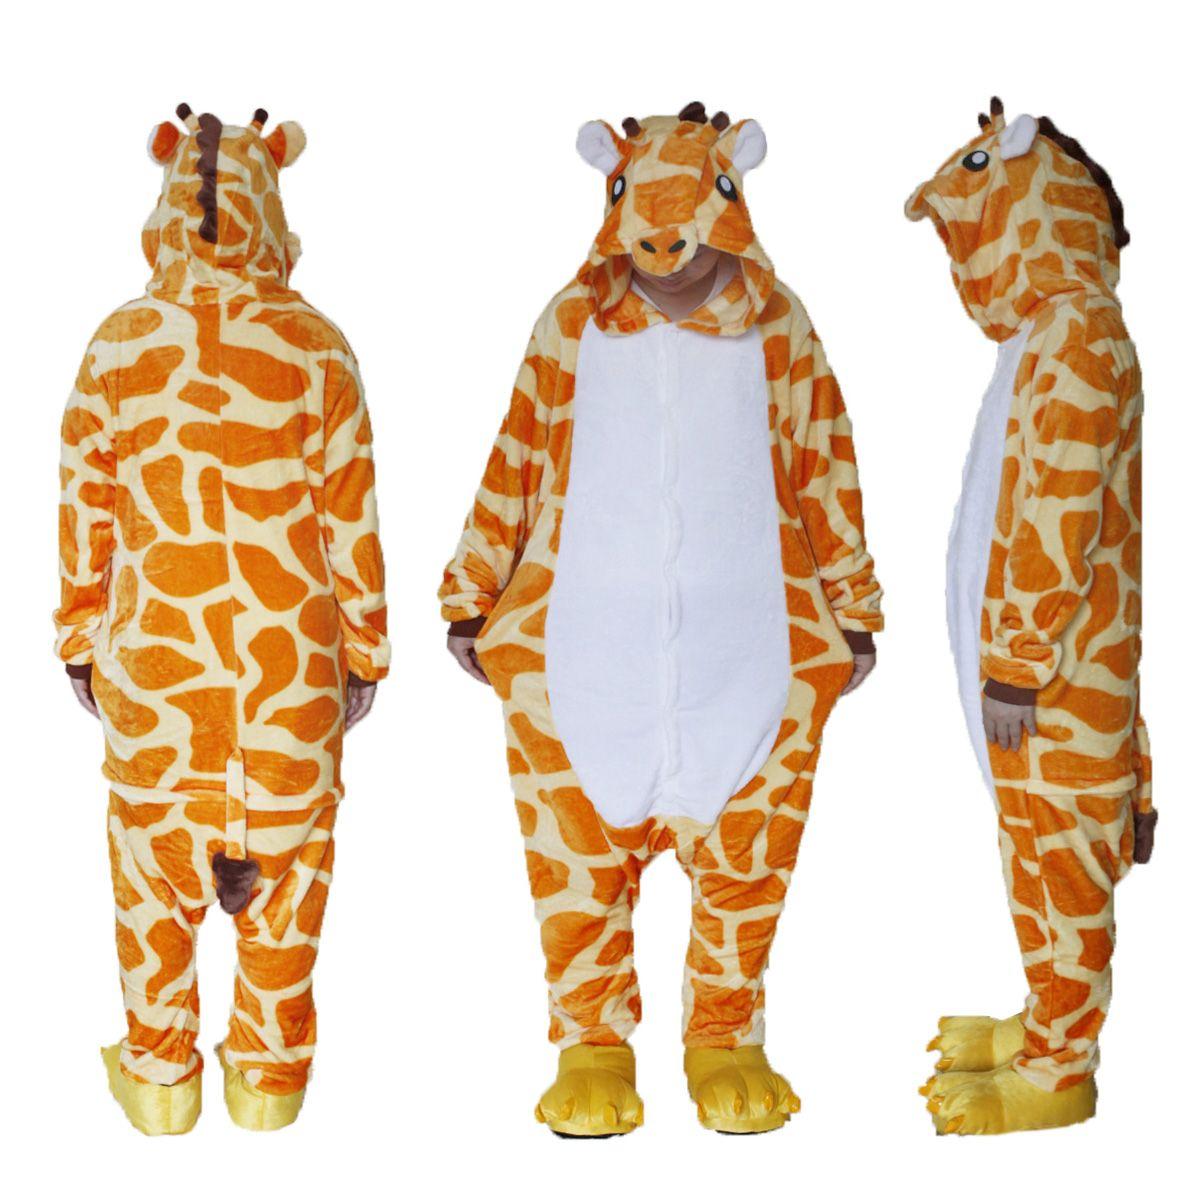 c1bc3a9812 Acquista Costume Da Giraffe Unisex Adulto In Pigiama Con Peluche A $20.3  Dal Dhwiner | DHgate.Com